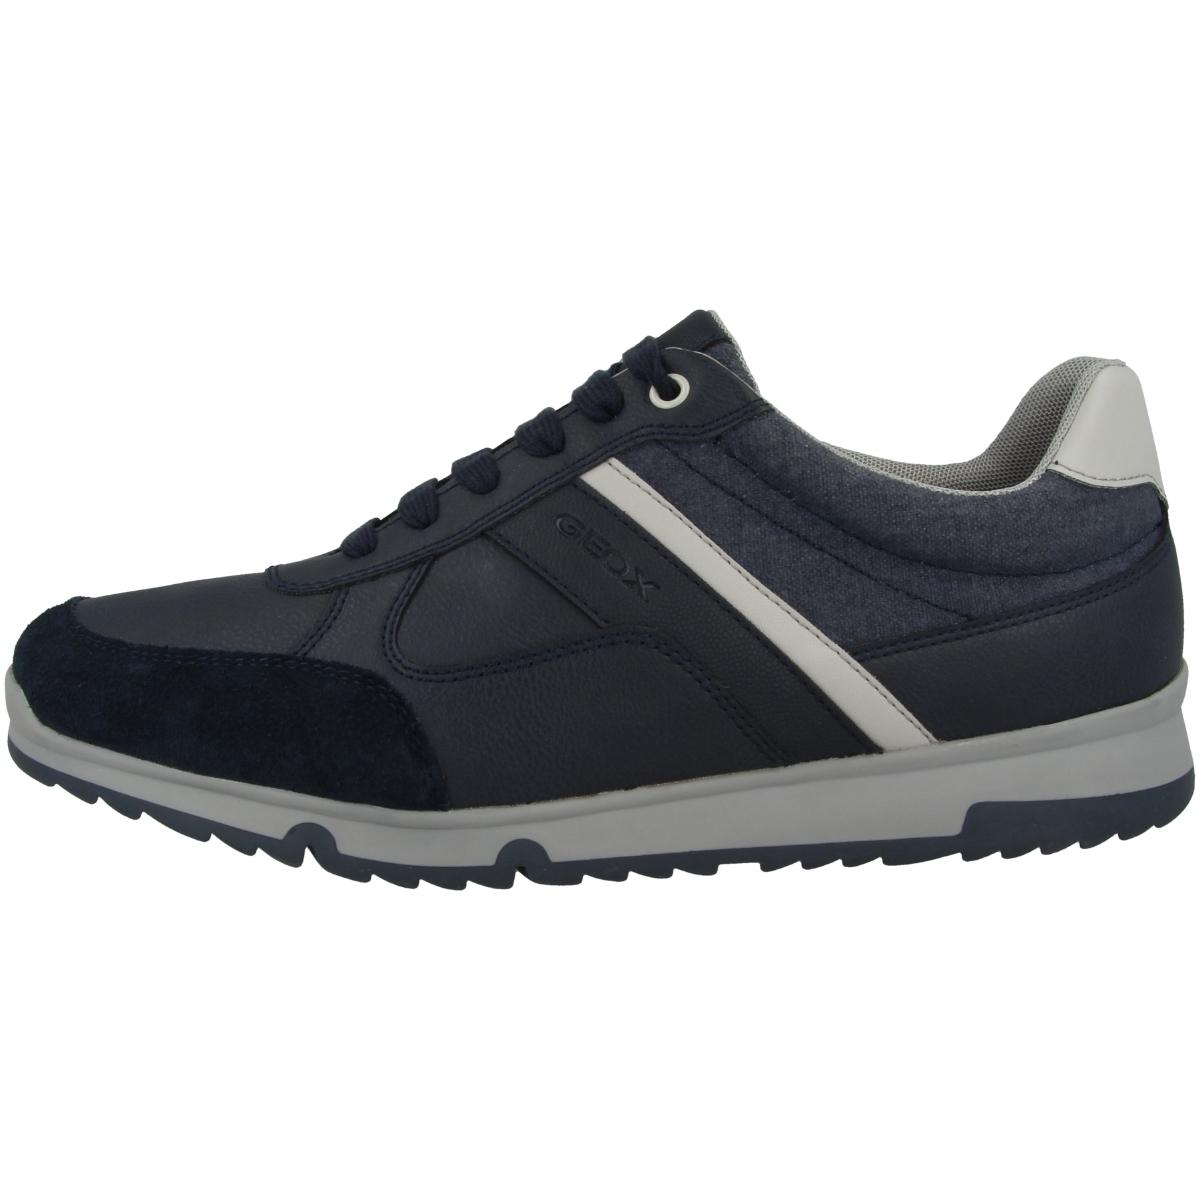 Geox U Wilmer A Chaussures Men Hommes Sneaker Chaussures Basses Chaussure Lacée U 023 XA 0 menbc